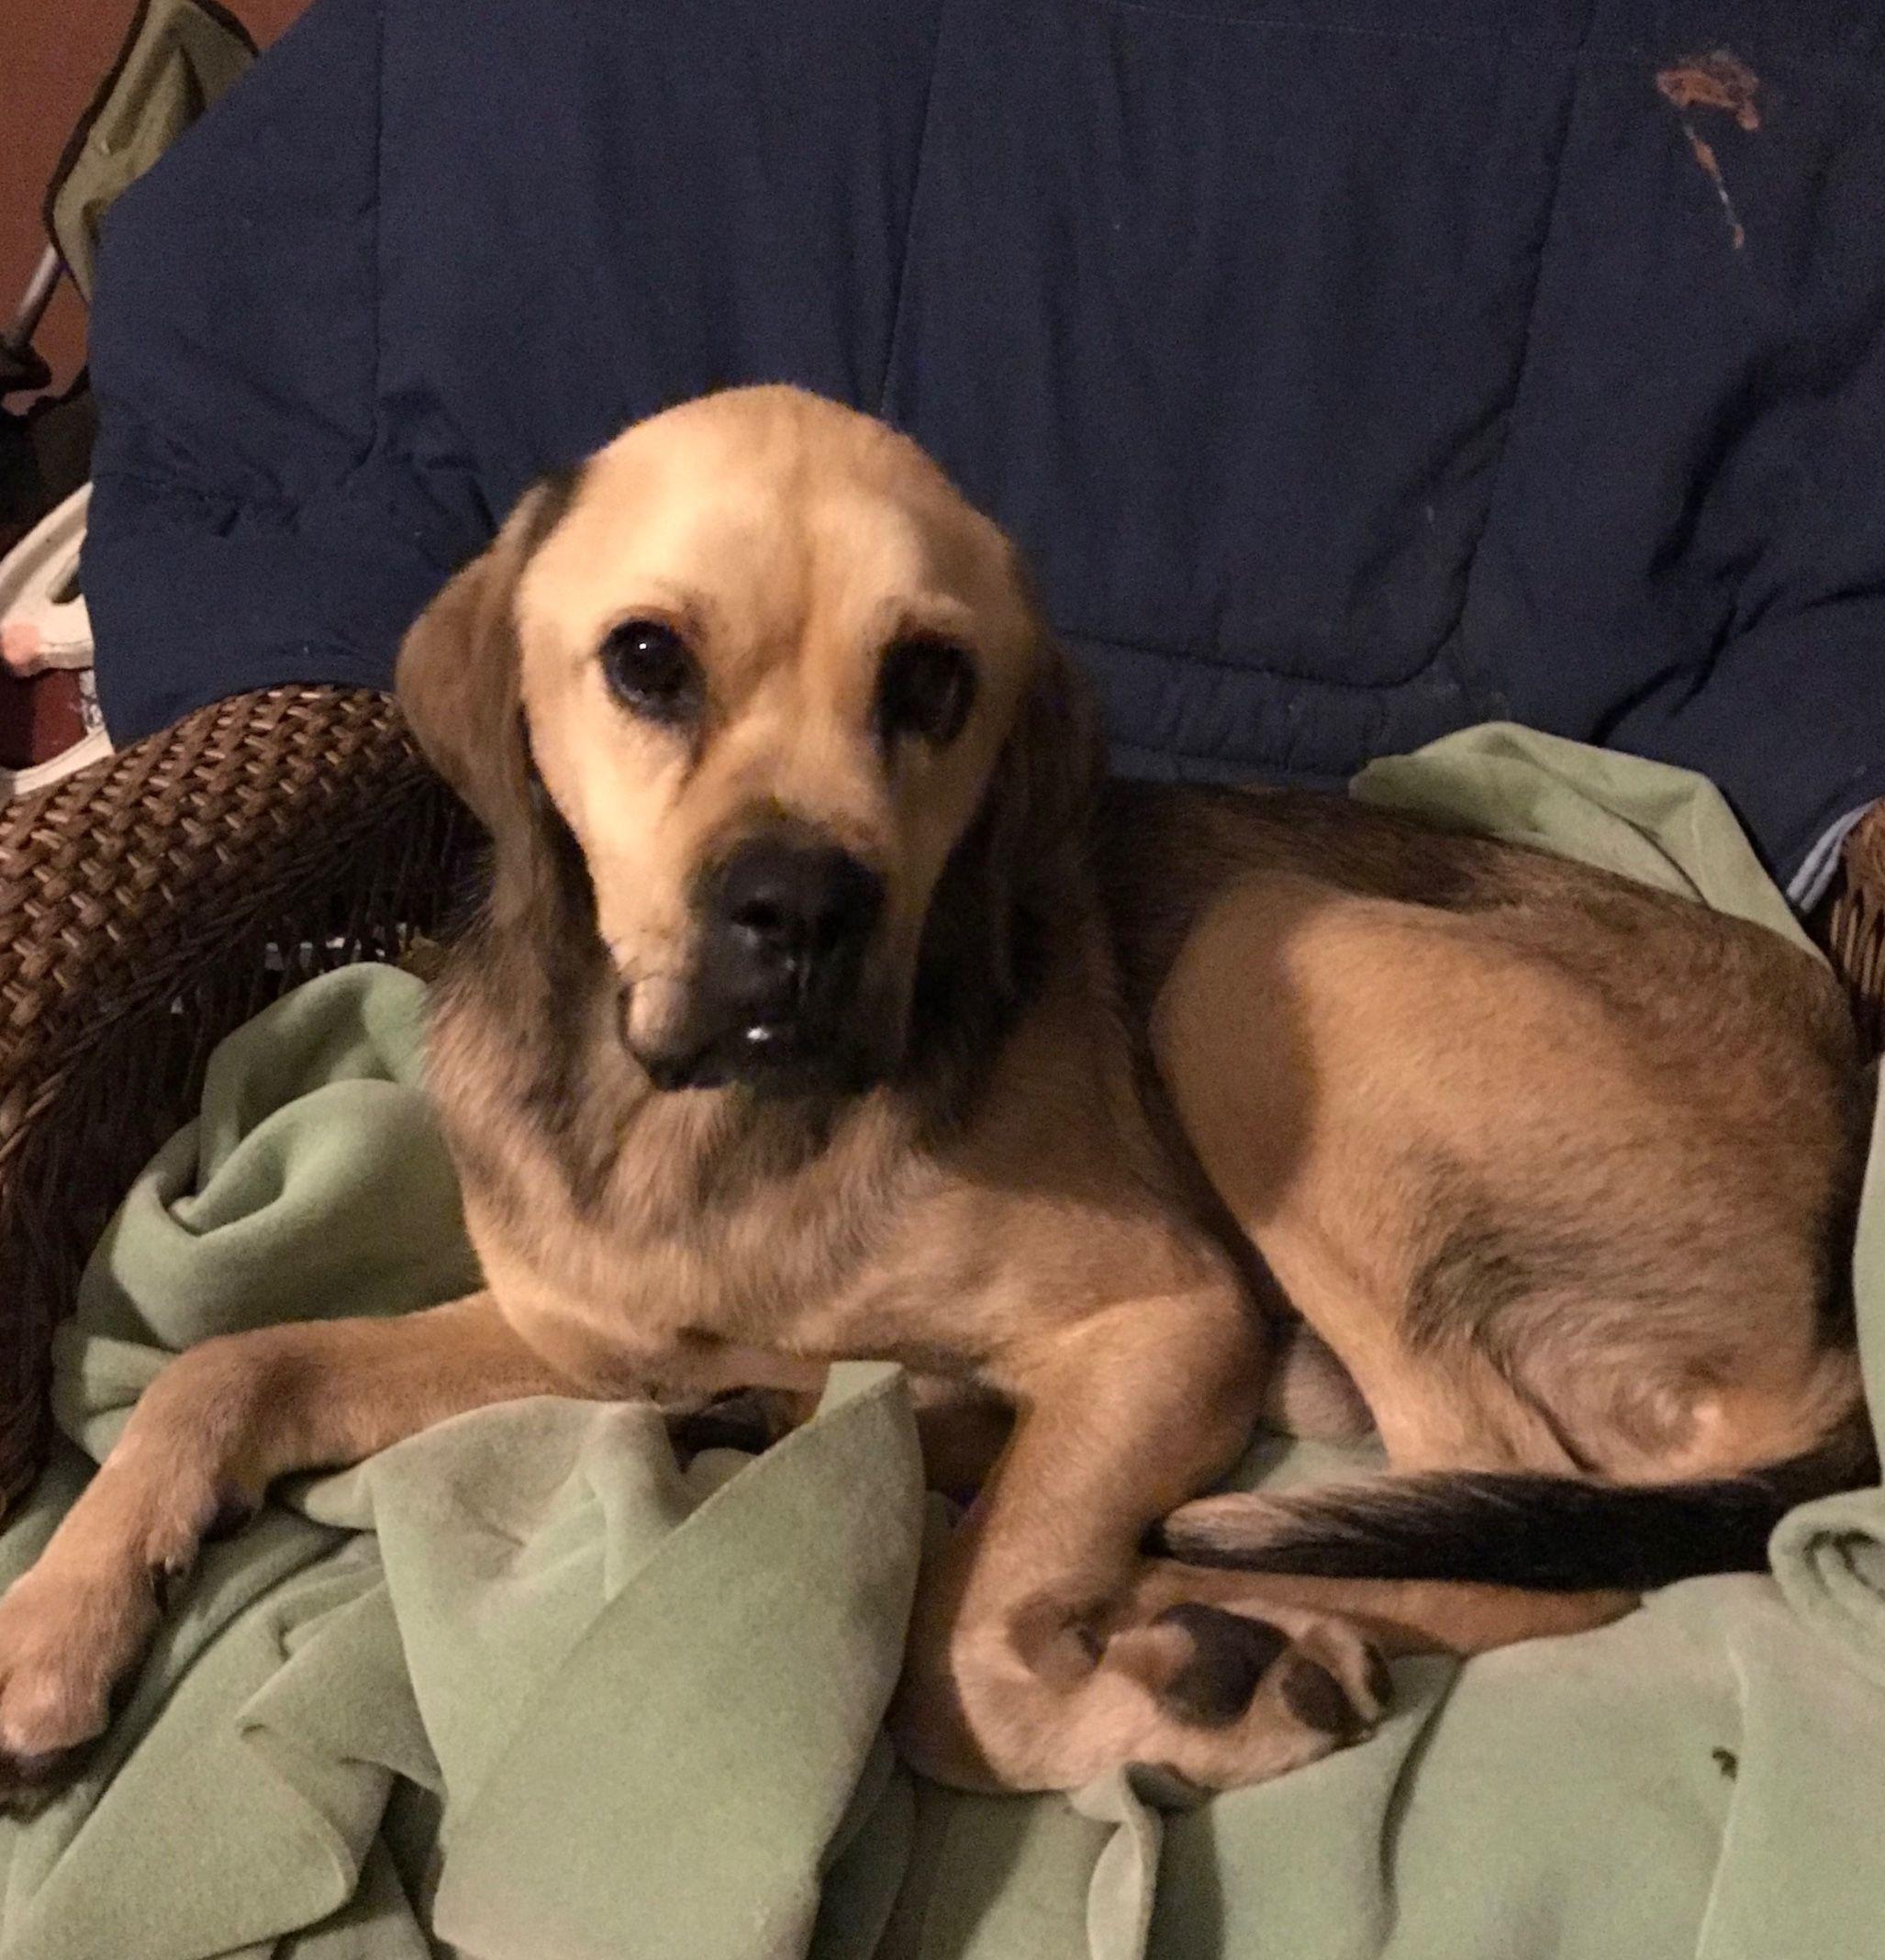 Labrador Retriever dog for Adoption in Pottstown, PA. ADN